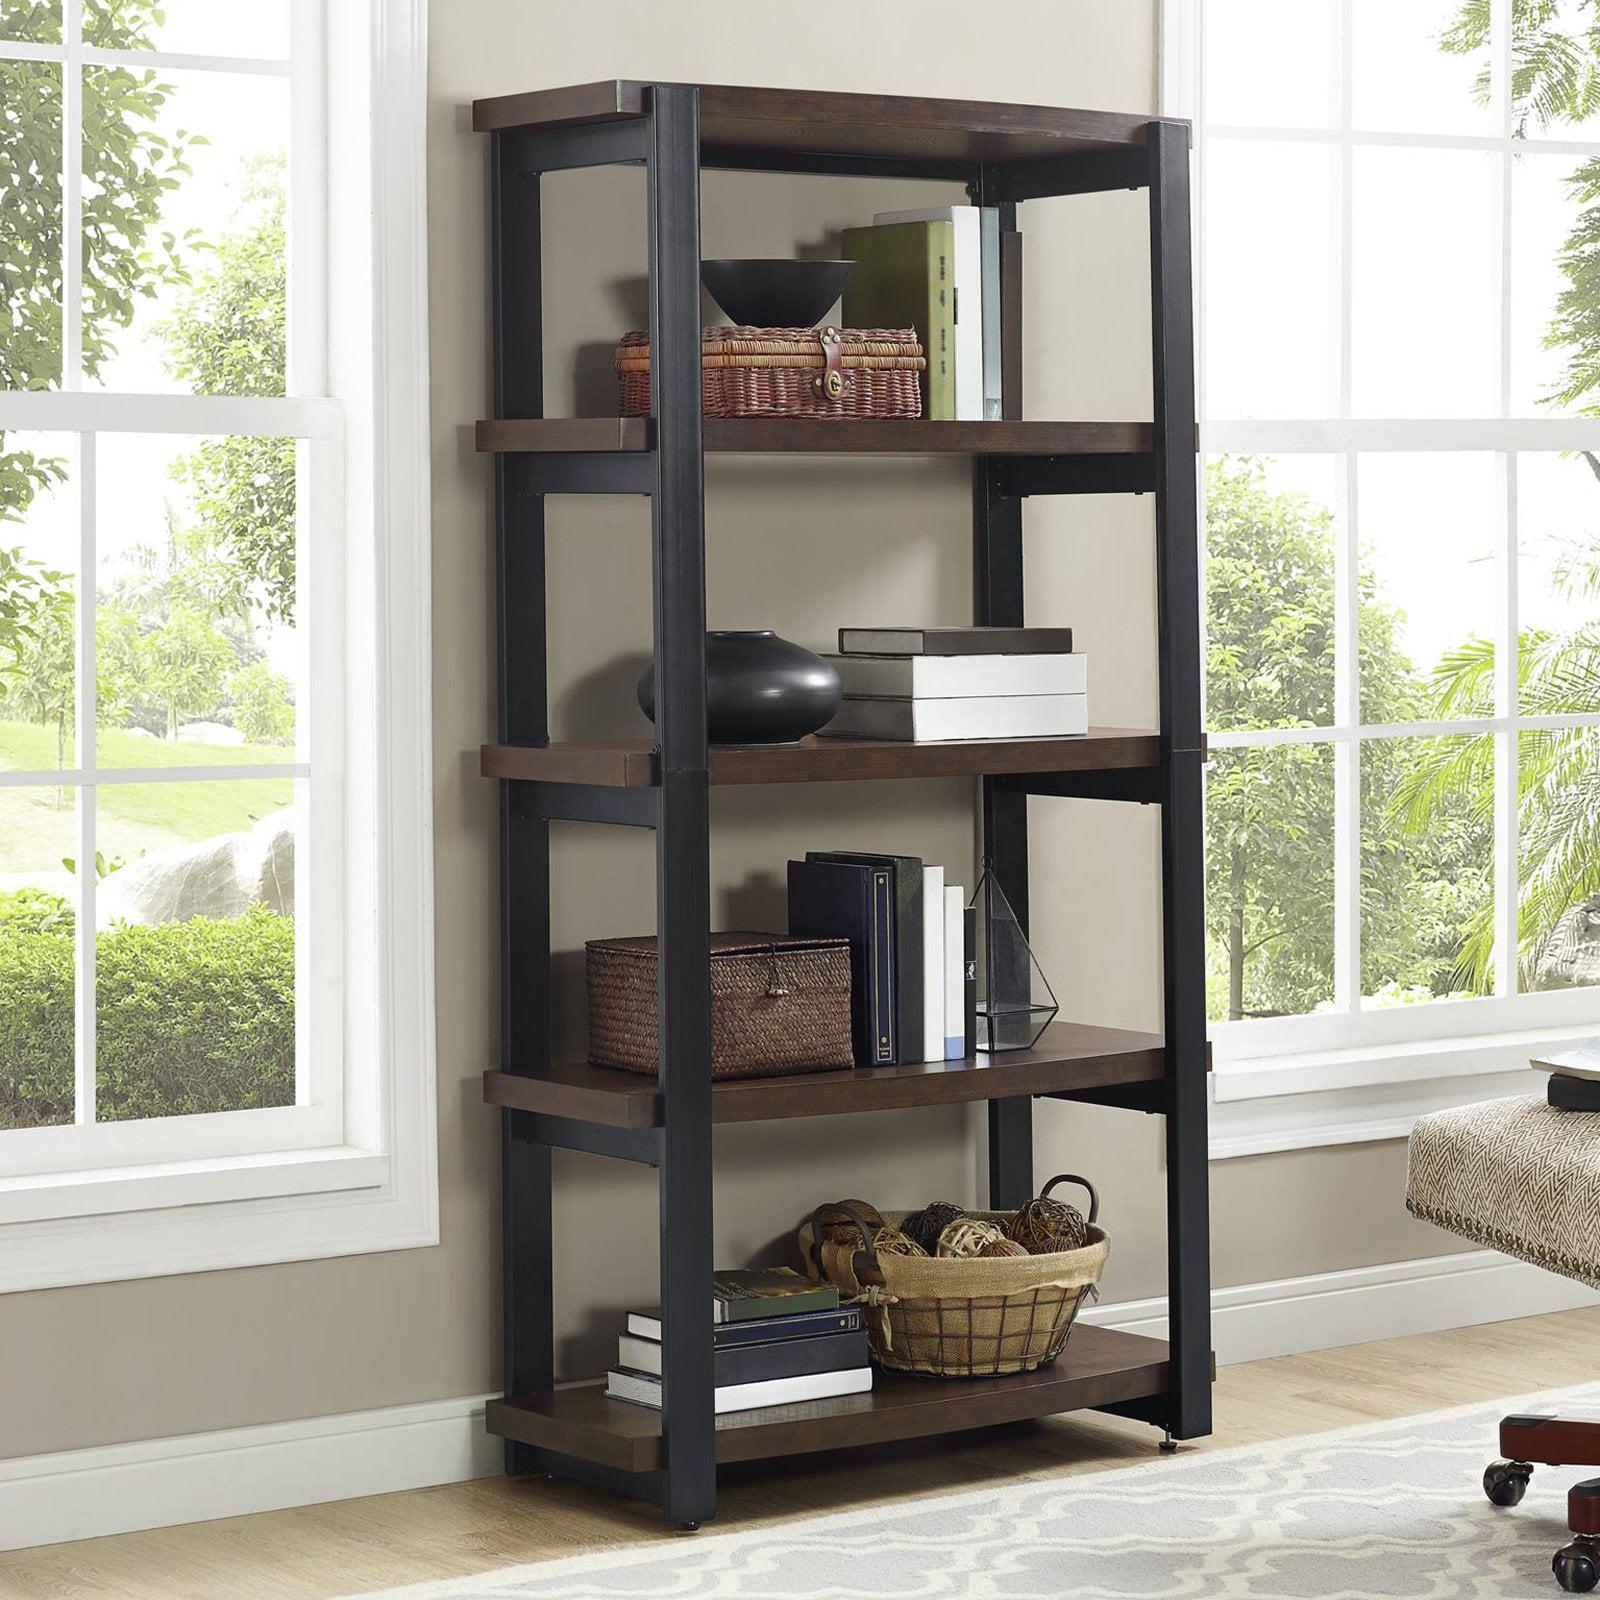 Ameriwood Castling Bookcase, Espresso by Ameriwood Home